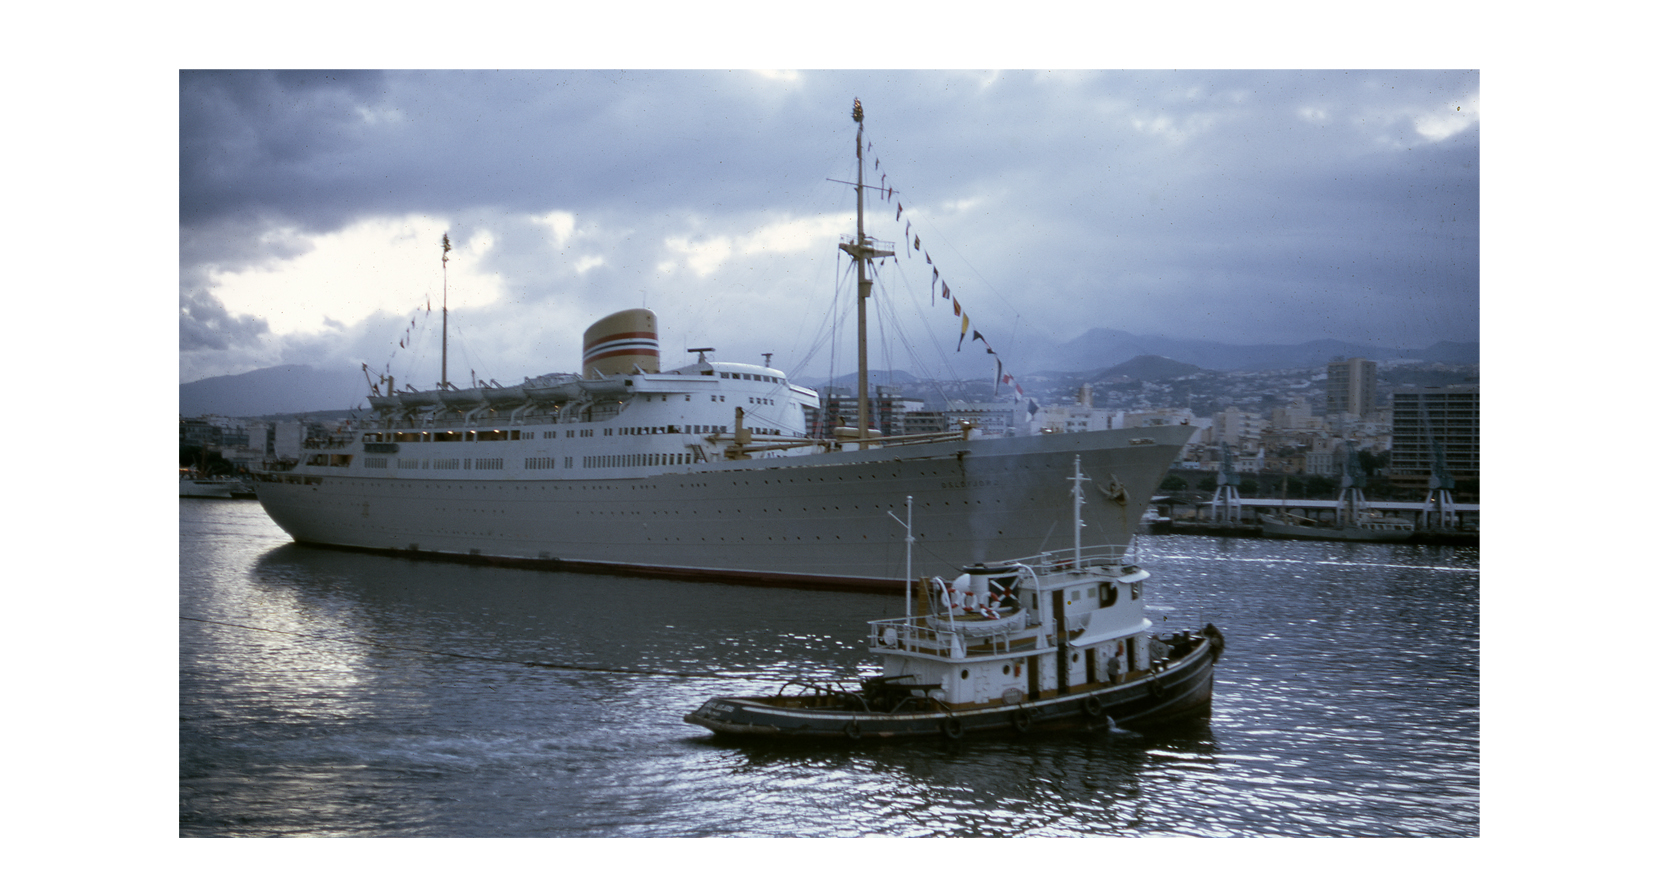 Liberia-1967-13.jpg